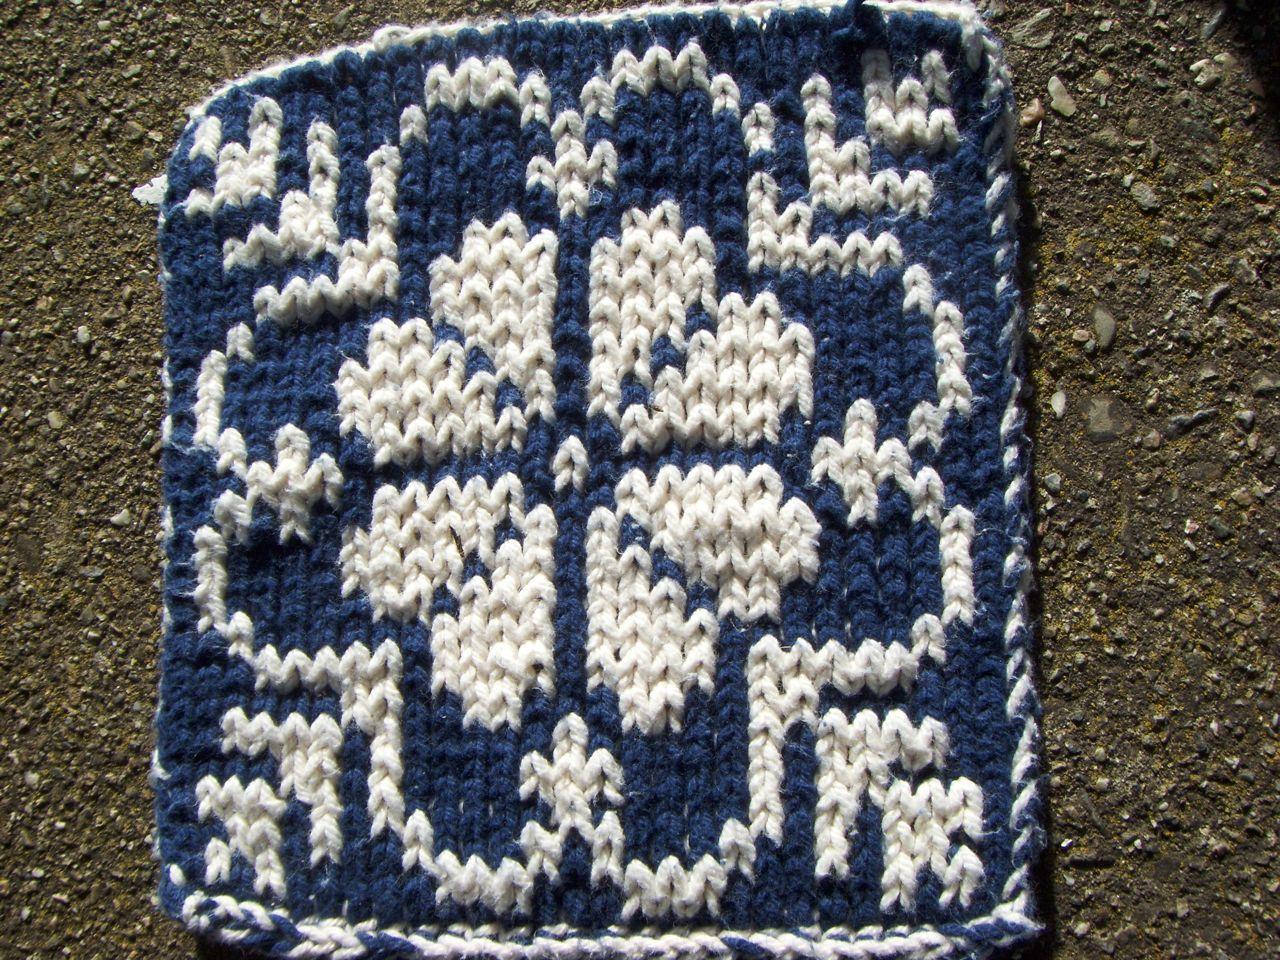 double knitting | knitting class ideas | Pinterest | Double knitting ...